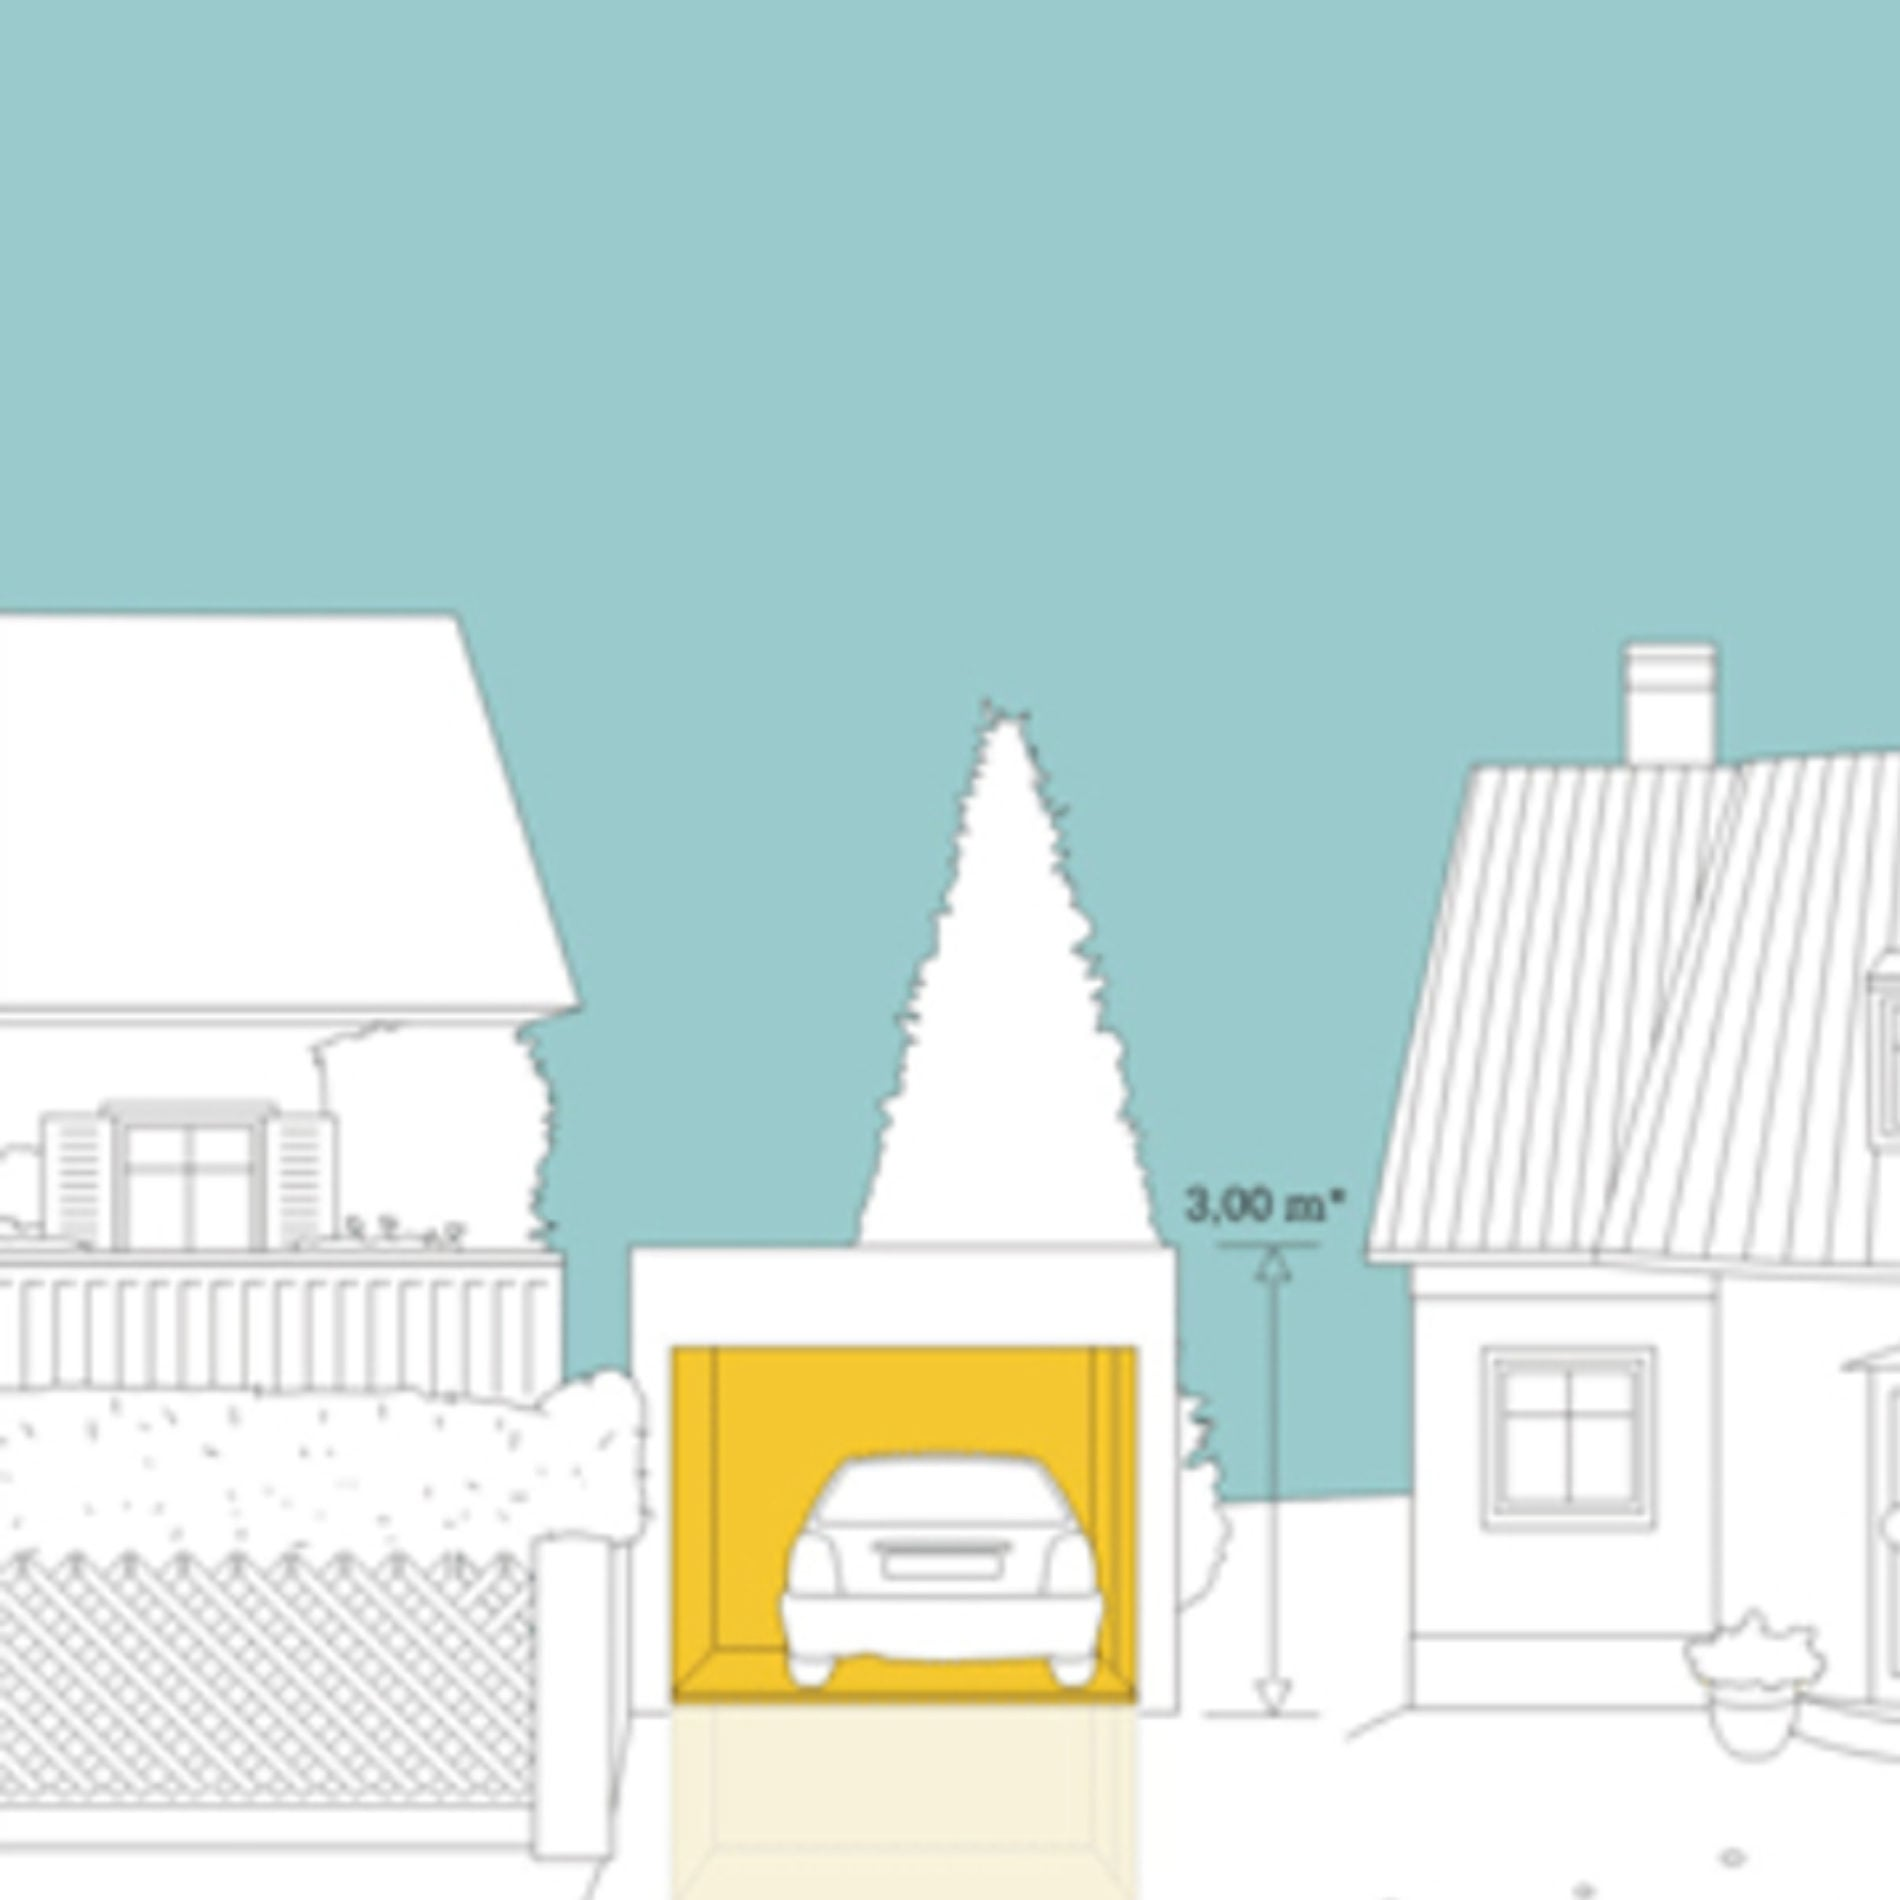 Carparkers Idee 4B